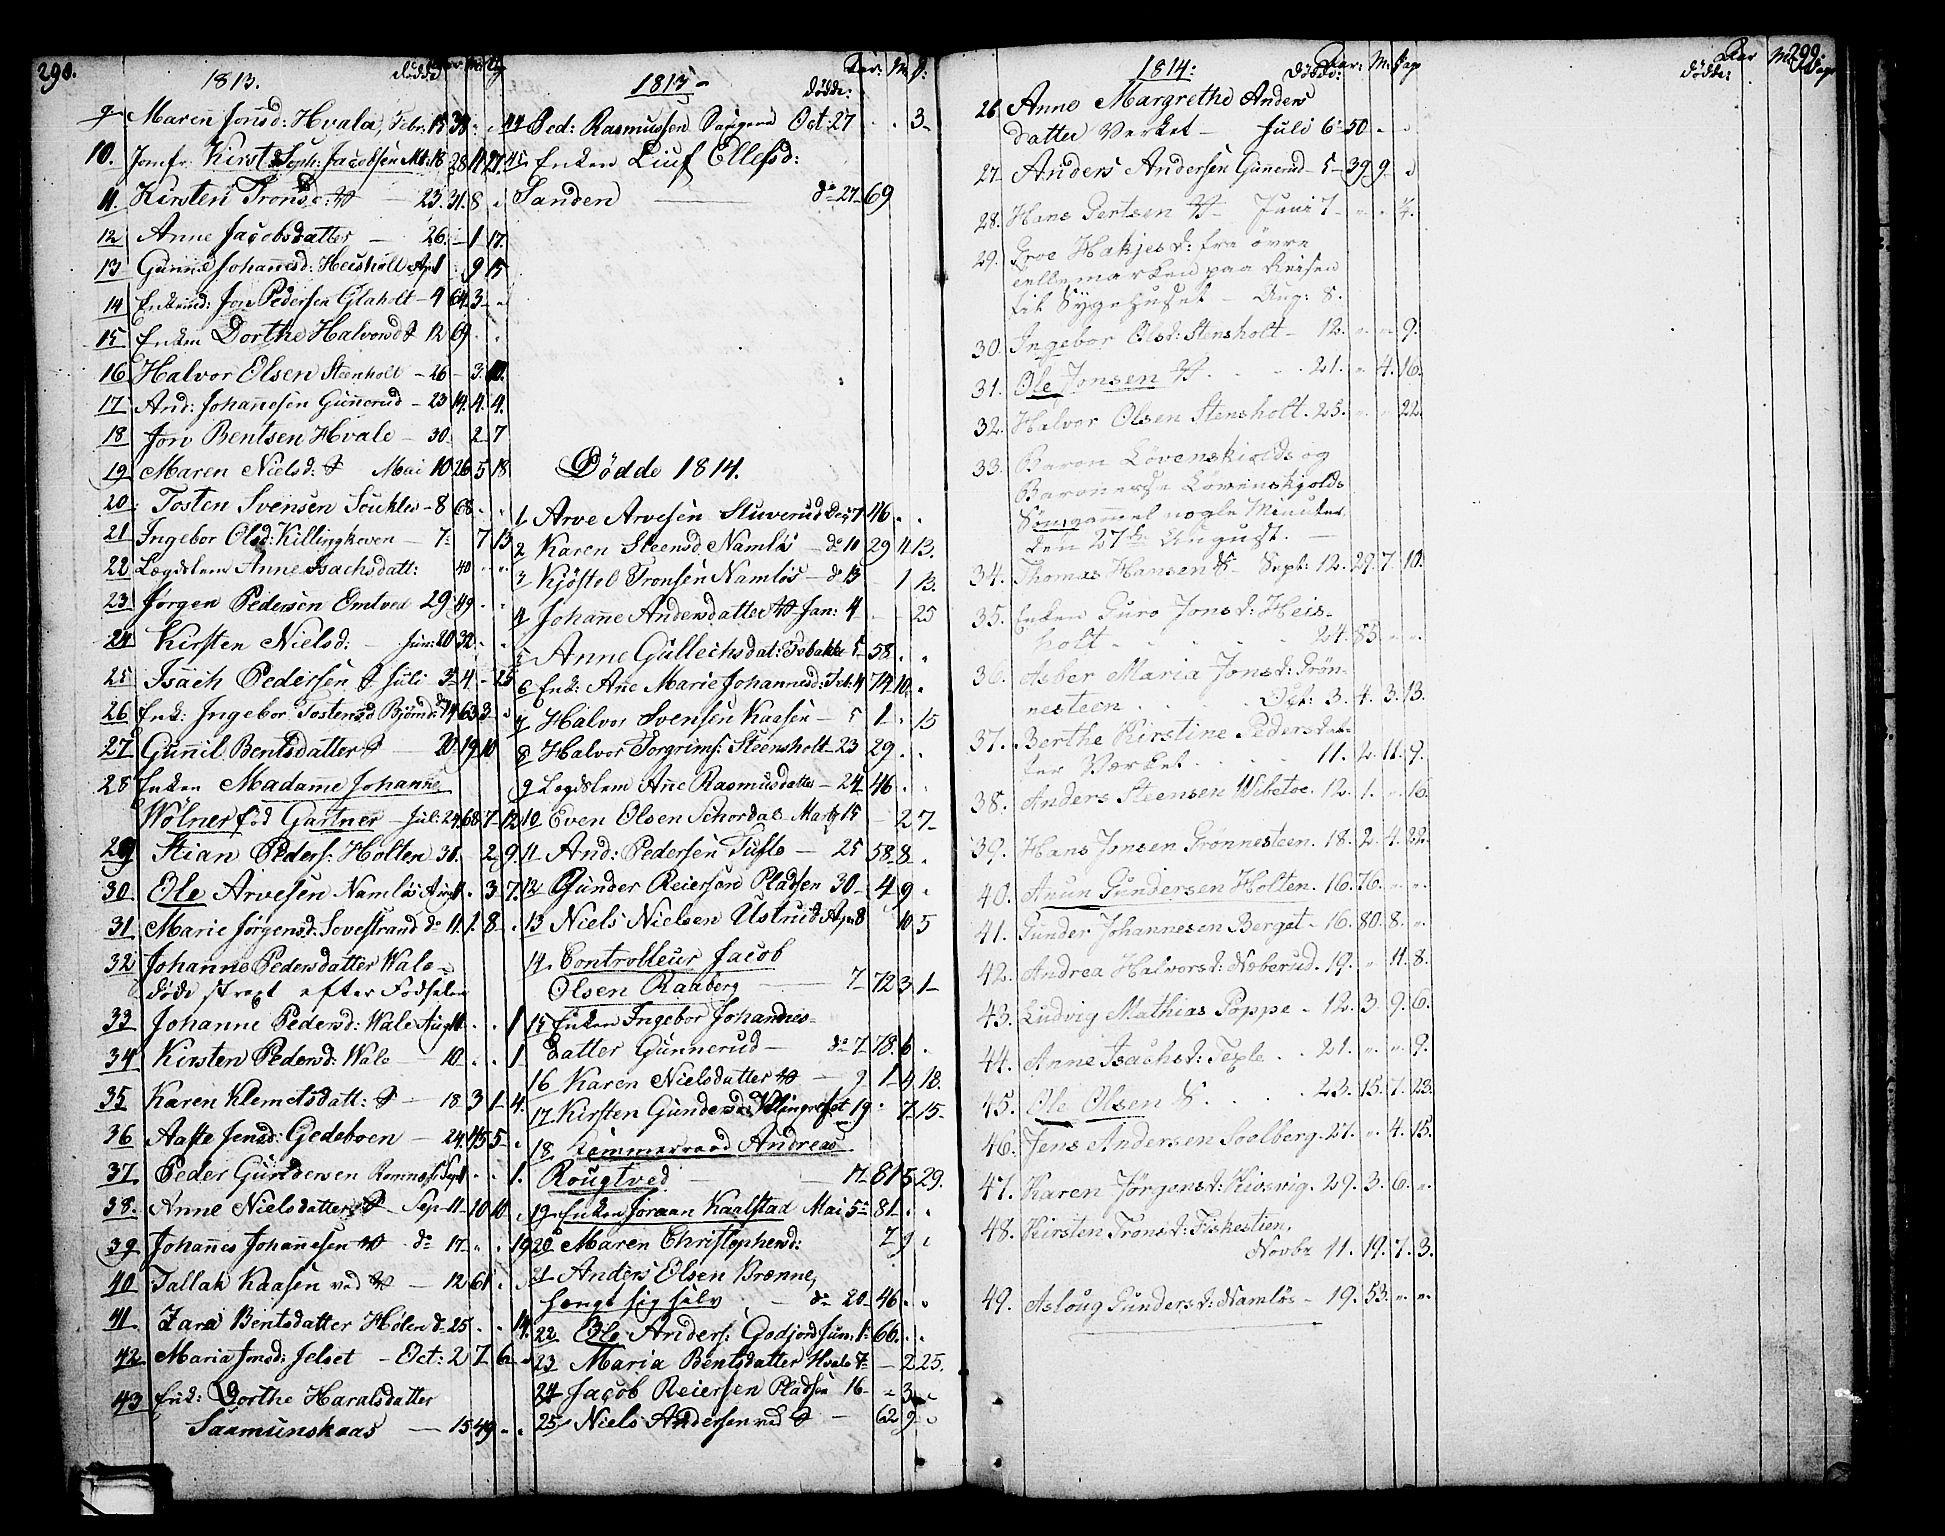 SAKO, Holla kirkebøker, F/Fa/L0002: Ministerialbok nr. 2, 1779-1814, s. 298-299